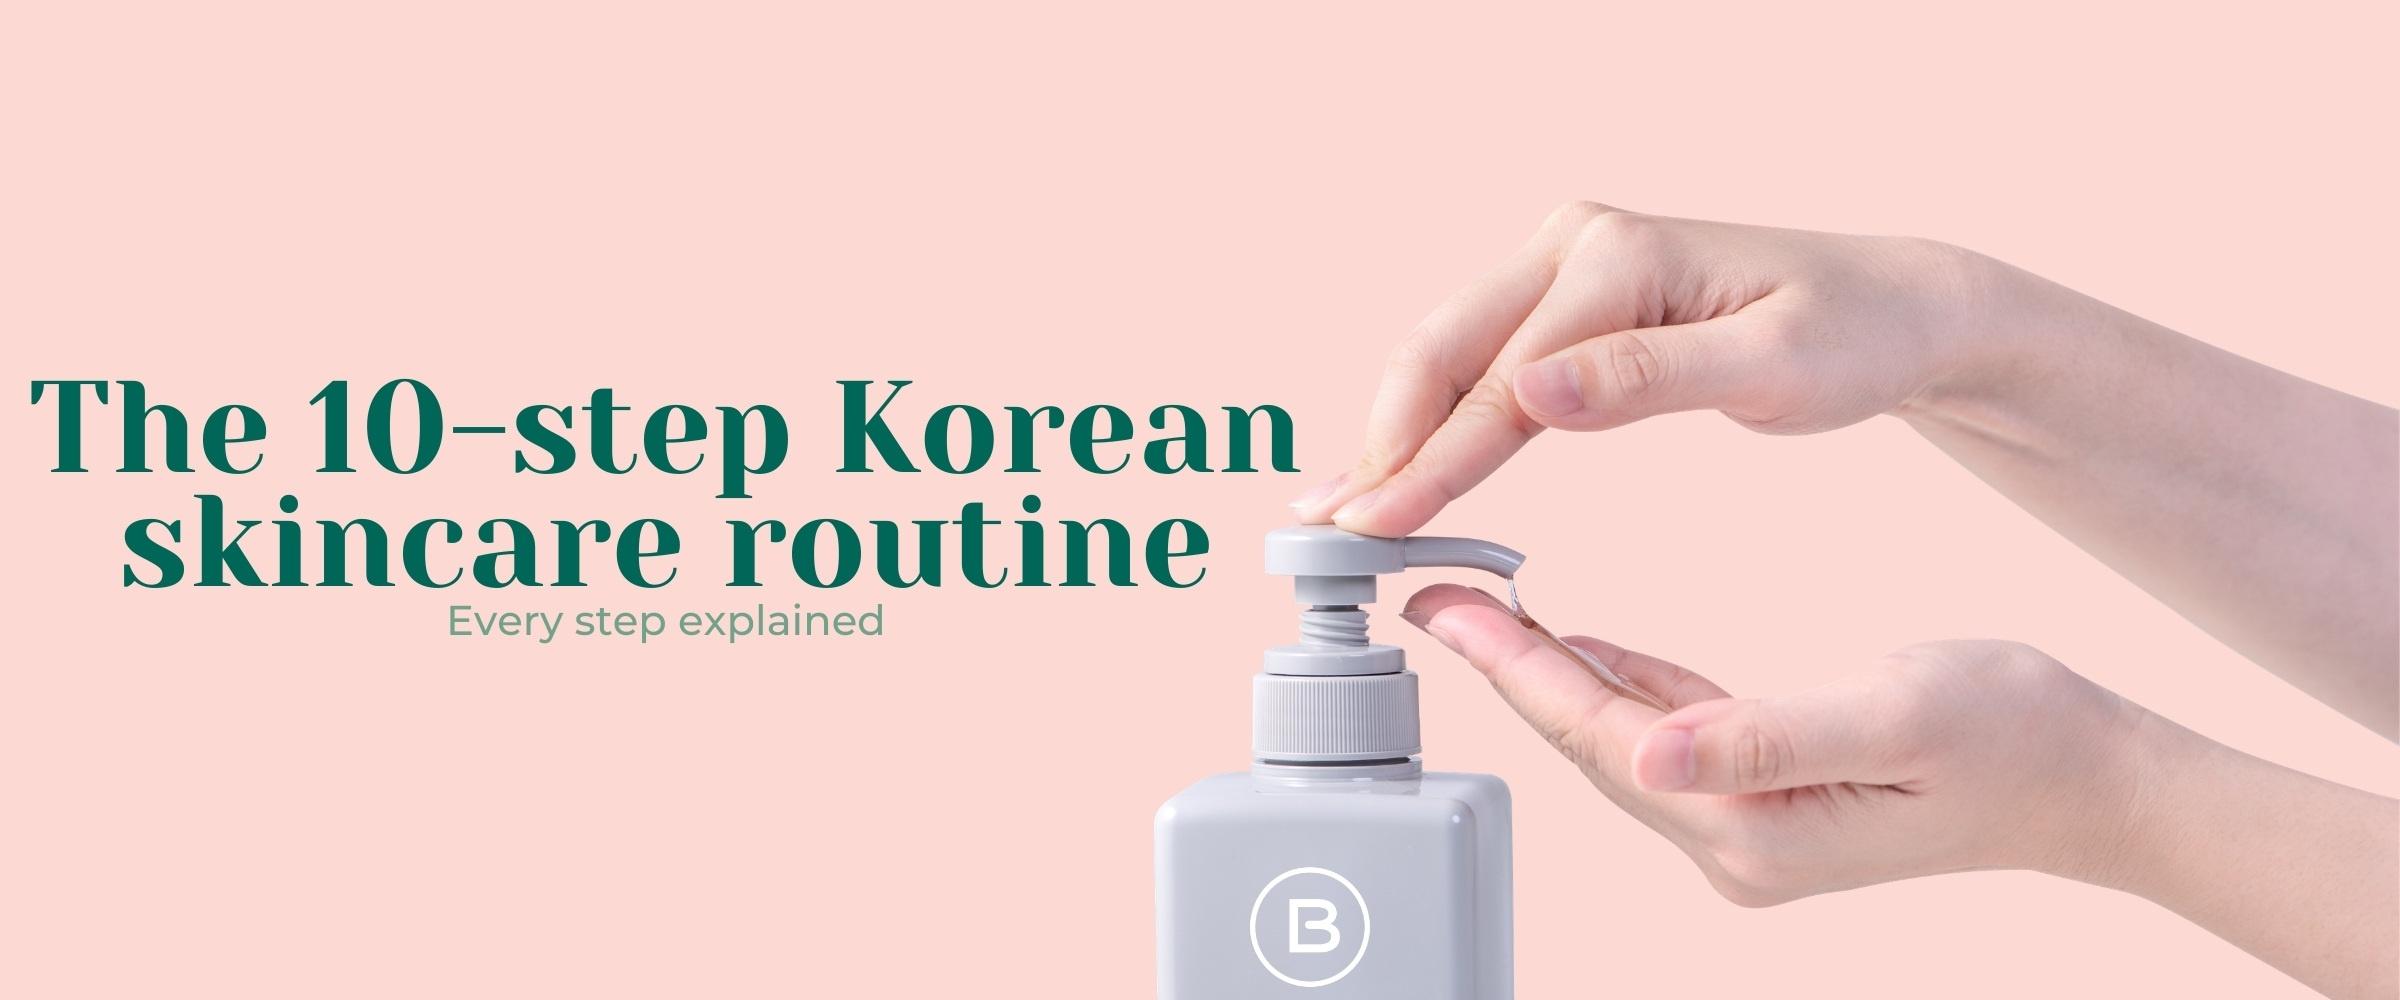 the korean 10-step skincare routine